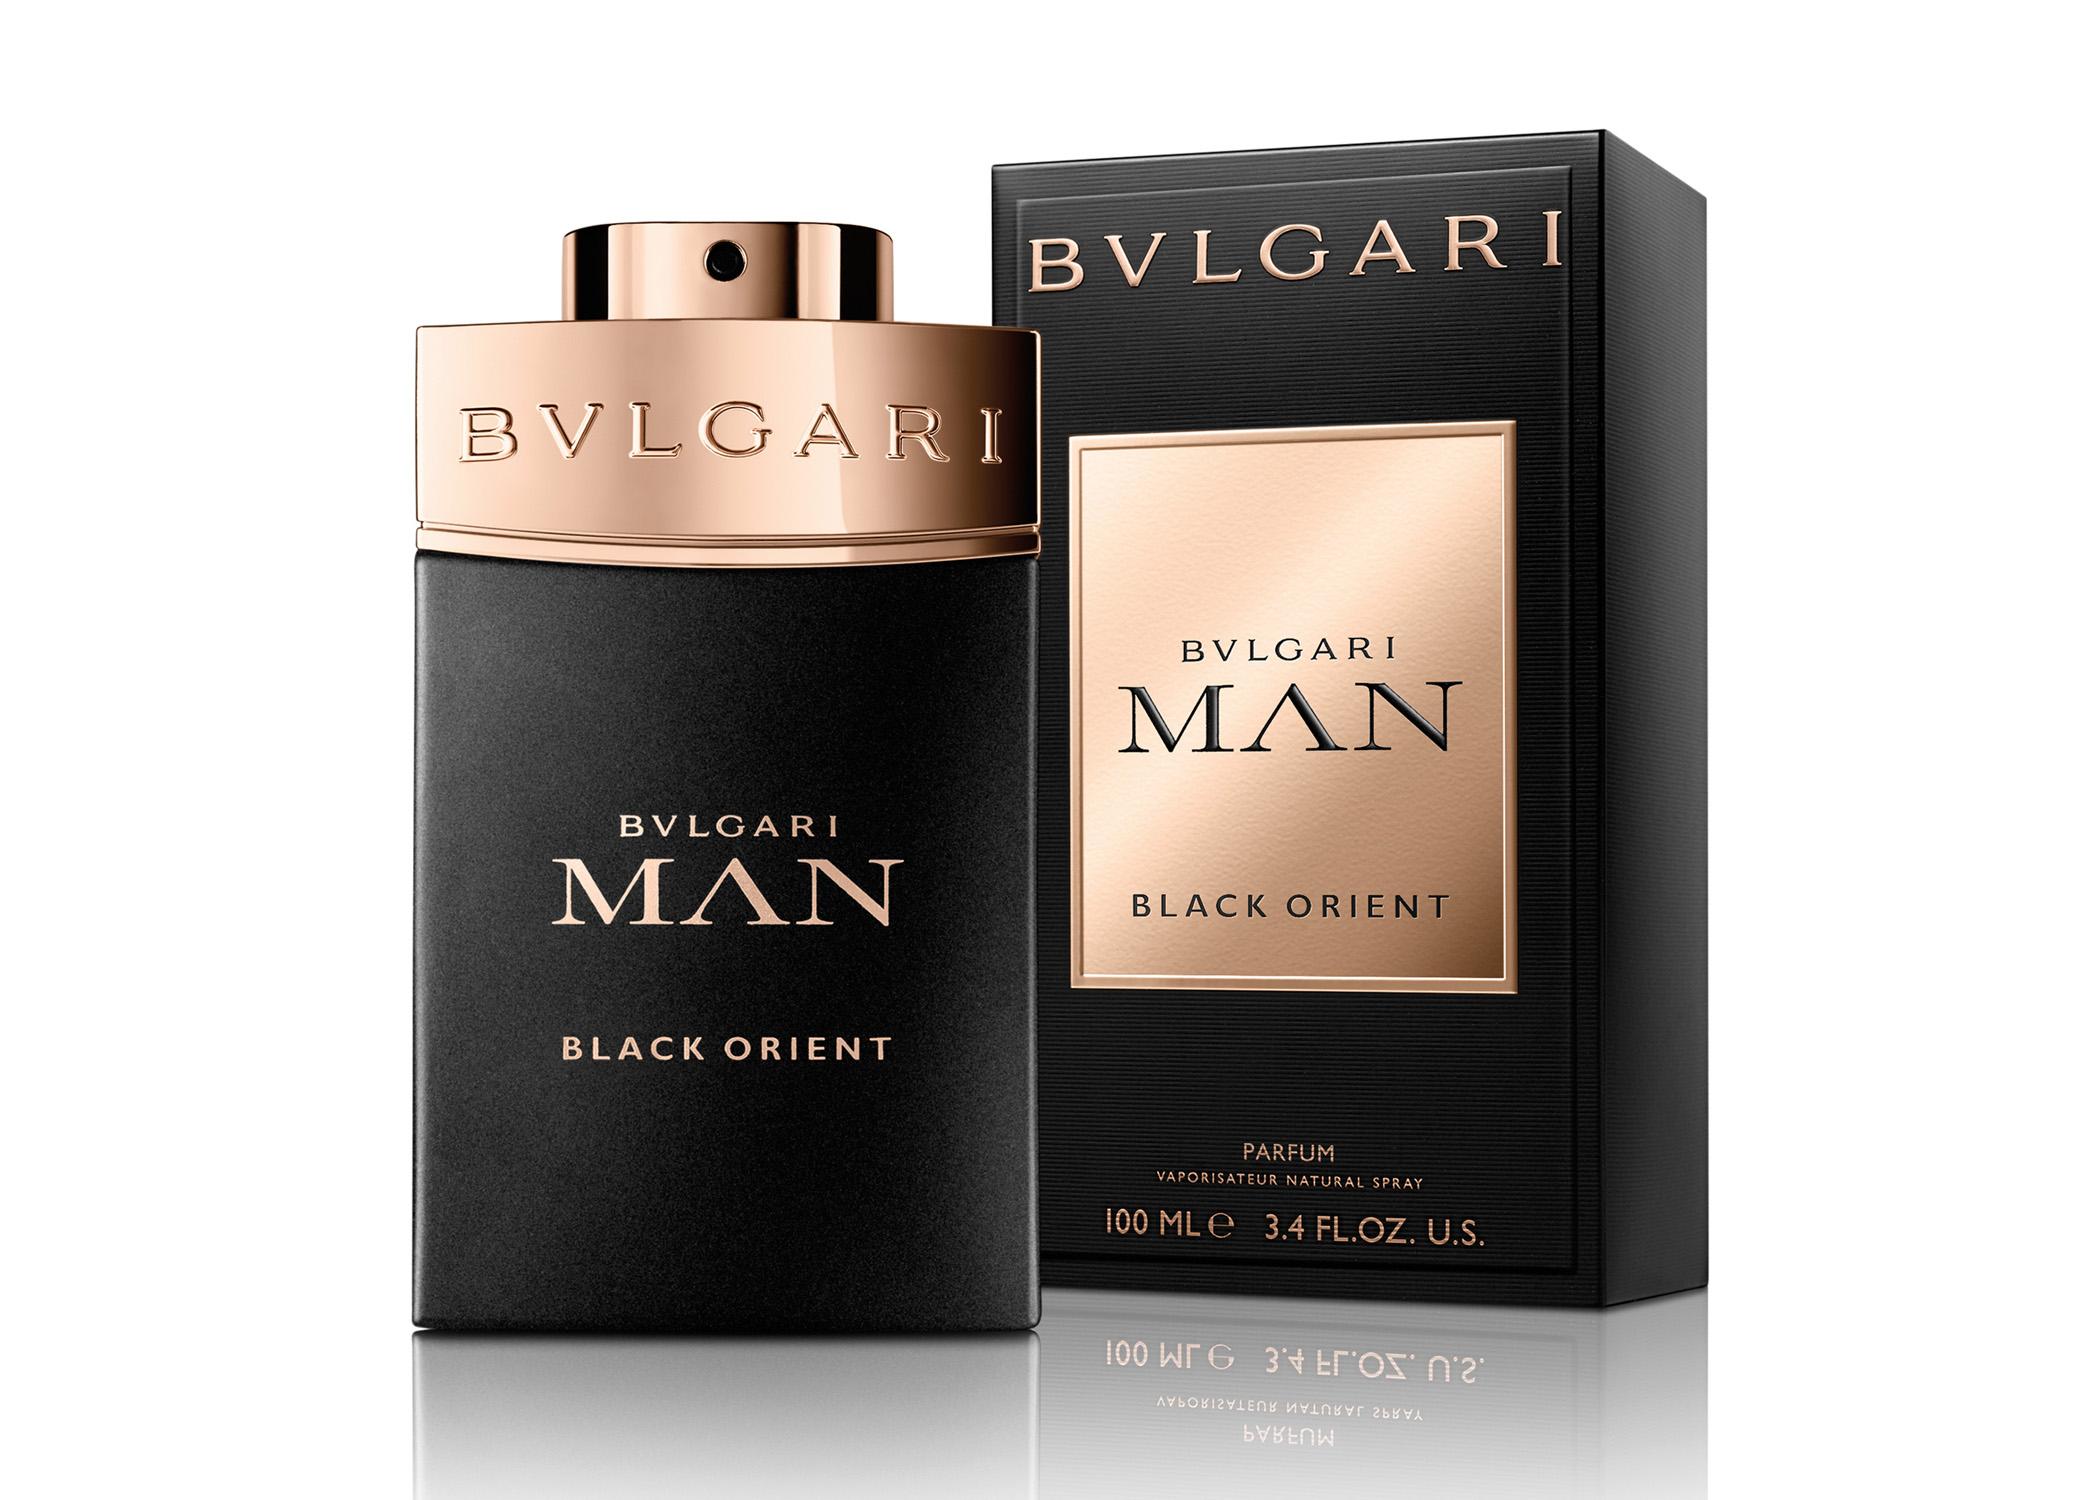 Bvlgari Man Black Orient, Parfémovaná voda 100ml